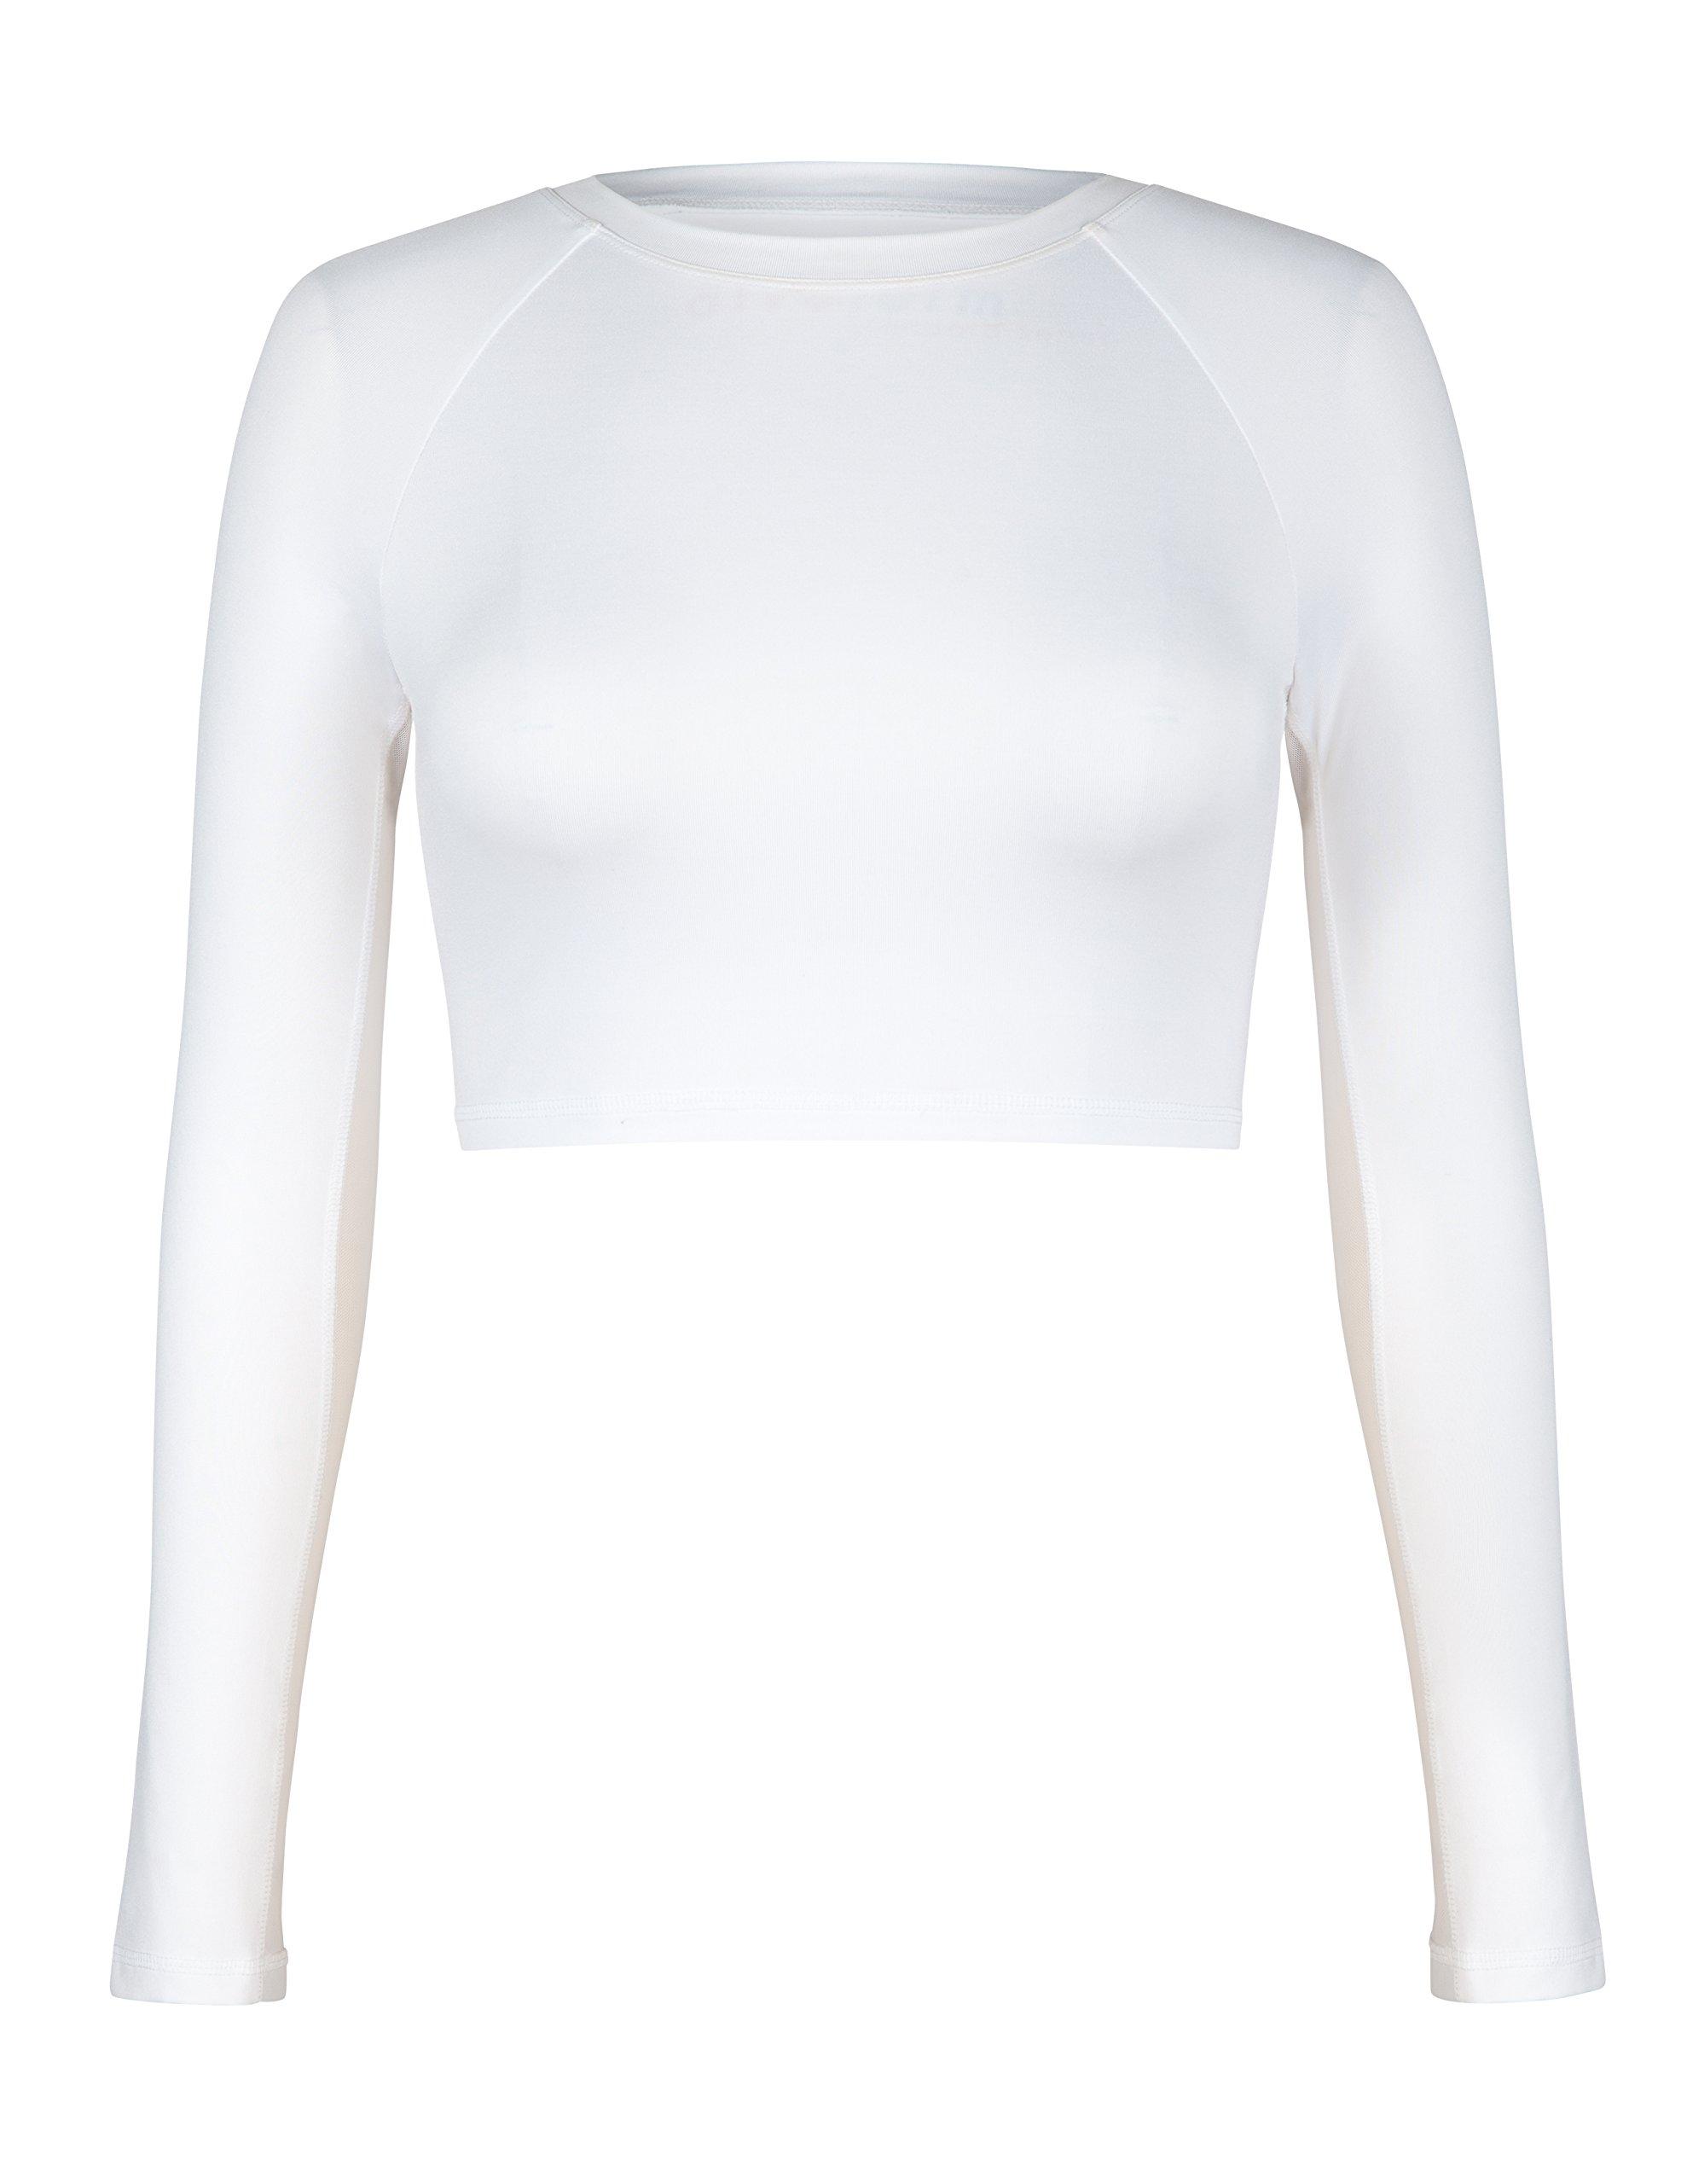 Tail Activewear Women's Sasha Crop Top Large White by Tail (Image #3)